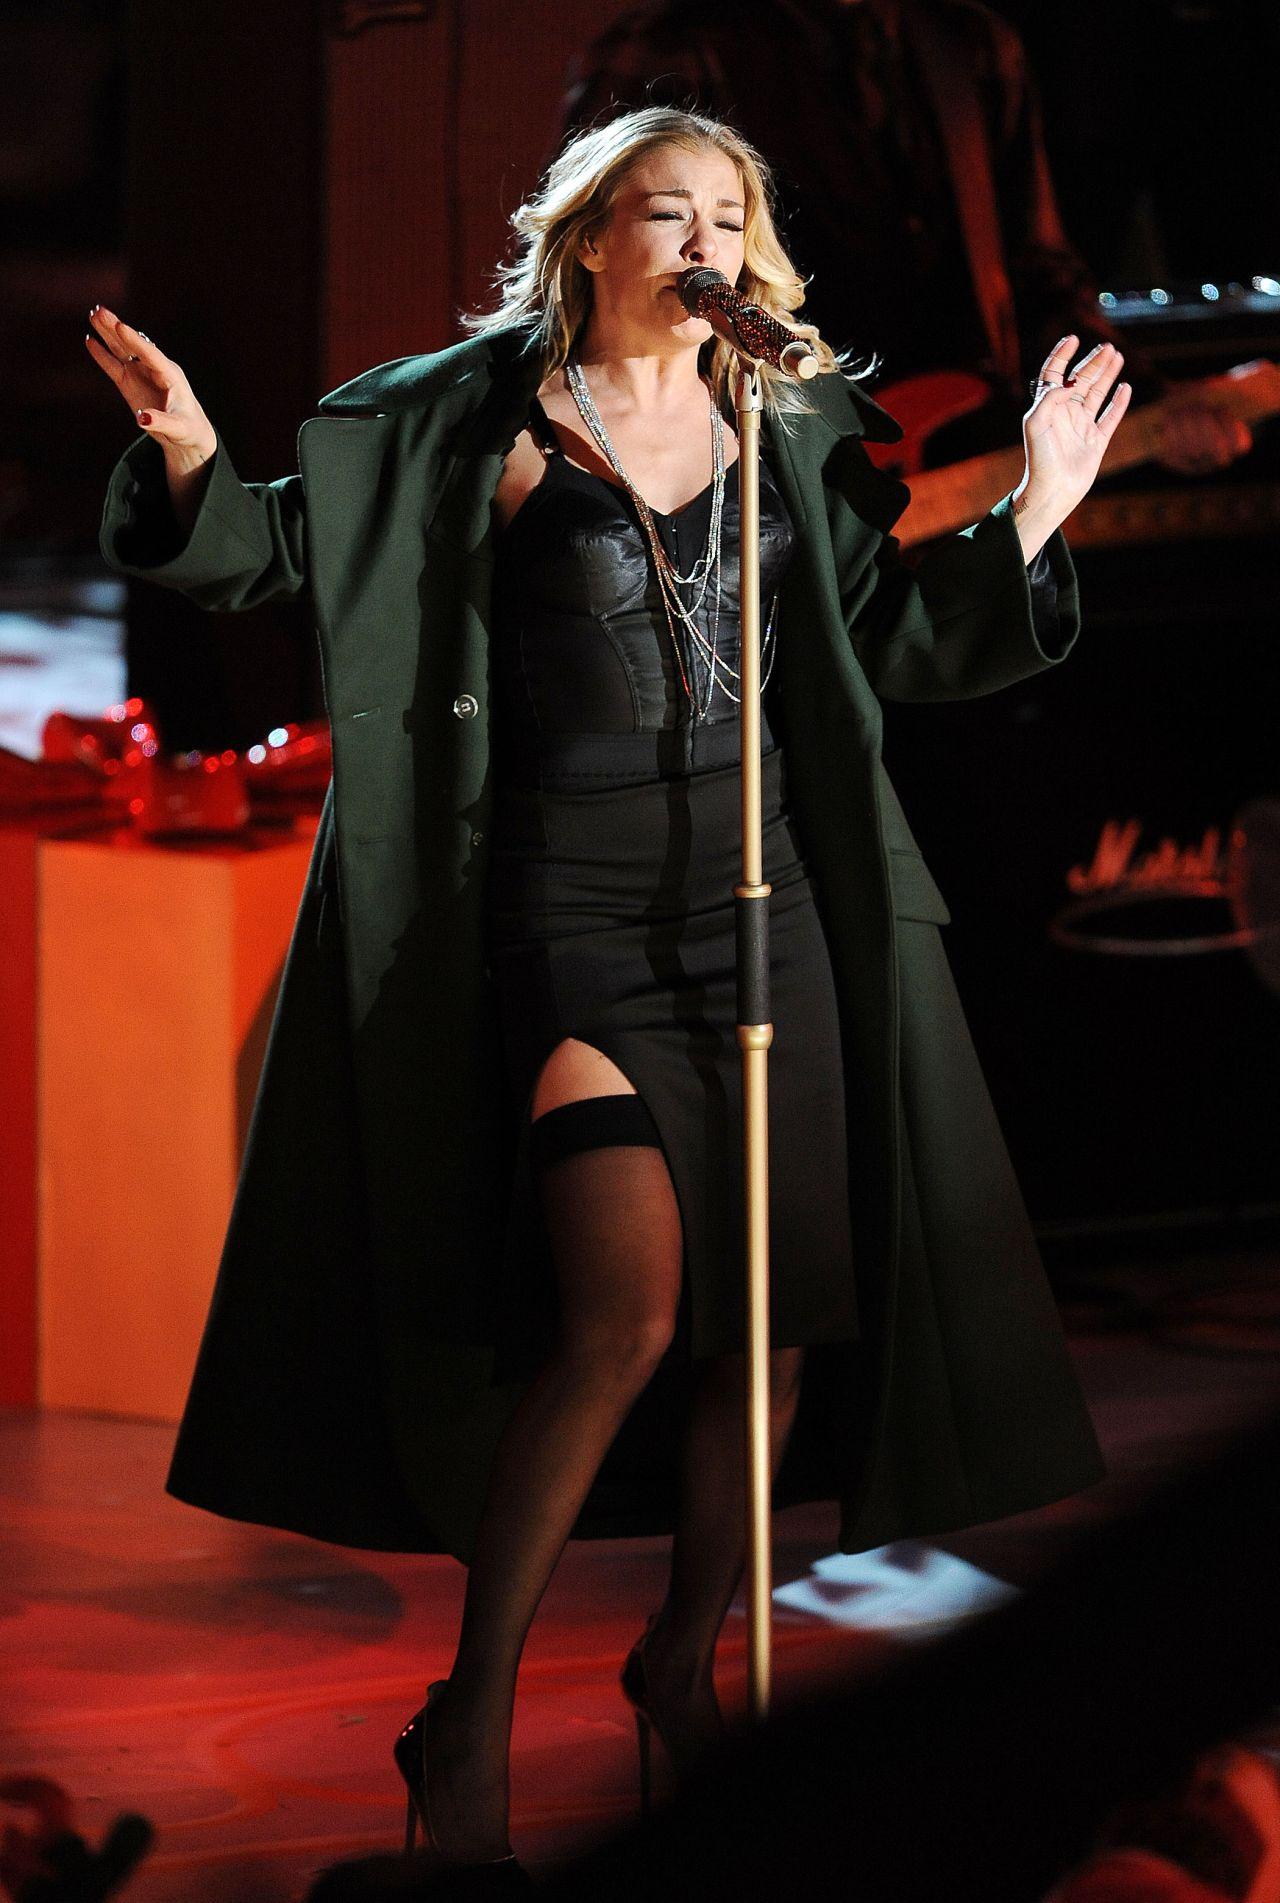 LeAnn Rimes Performs at 2014 Rockefeller Christmas Tree Lighting Ceremony in New York City